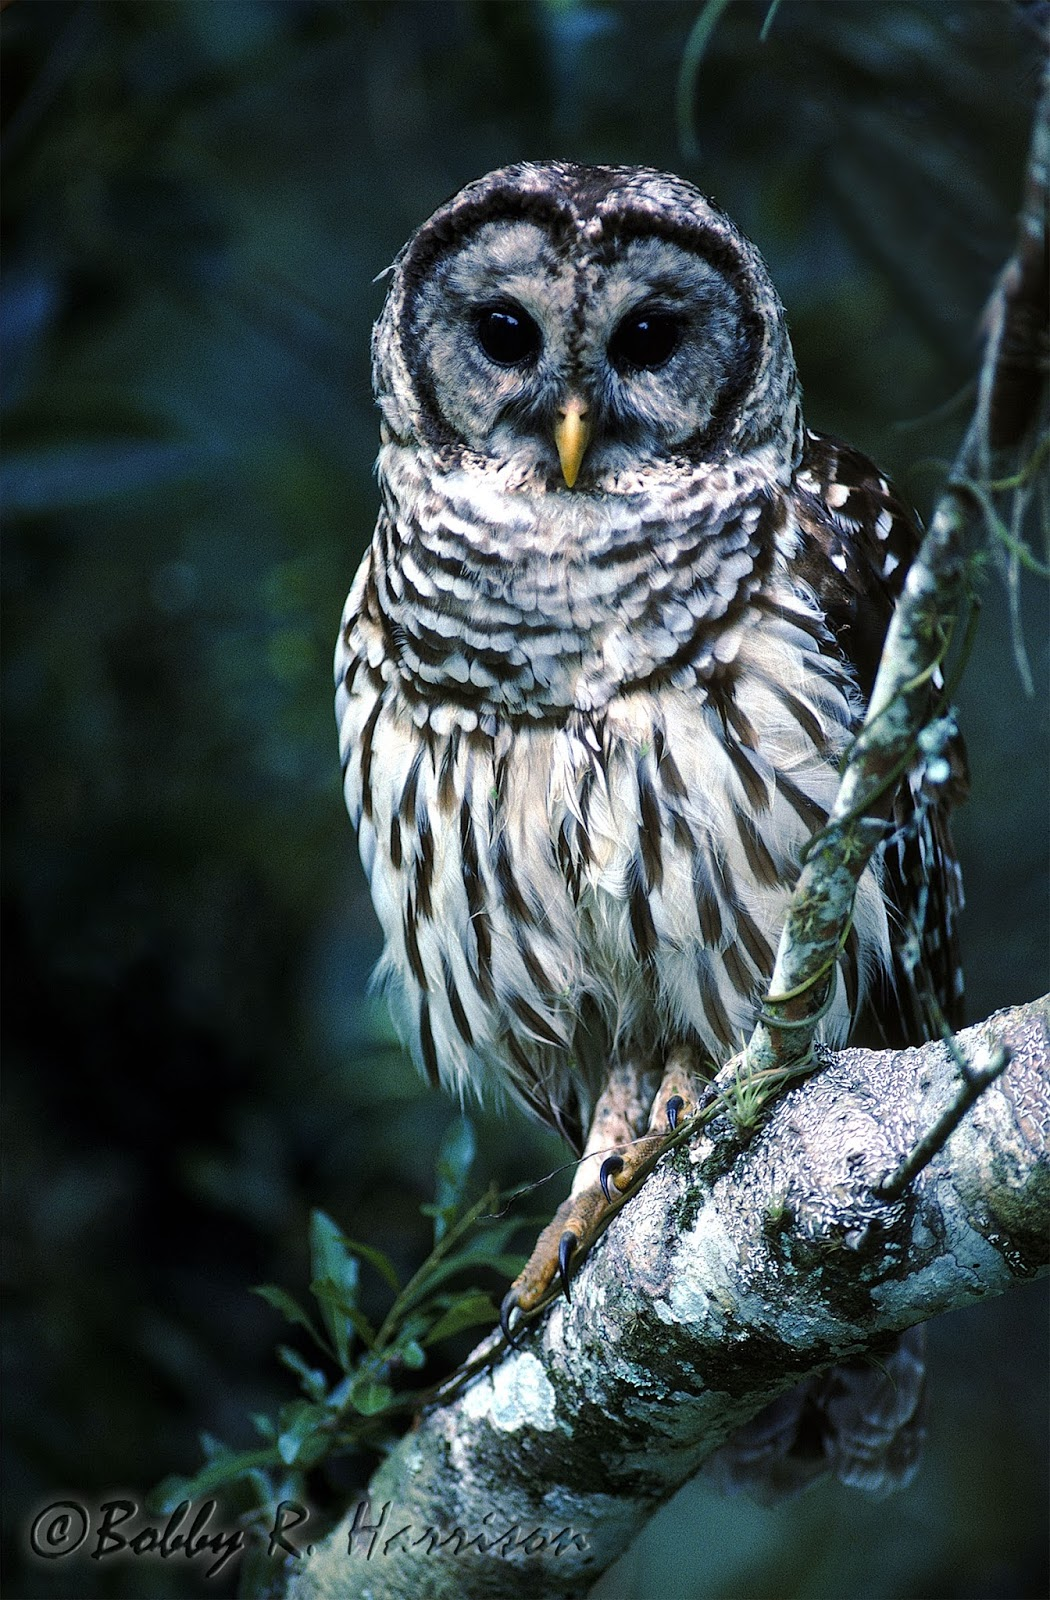 Barred Owl | Audubon Field Guide